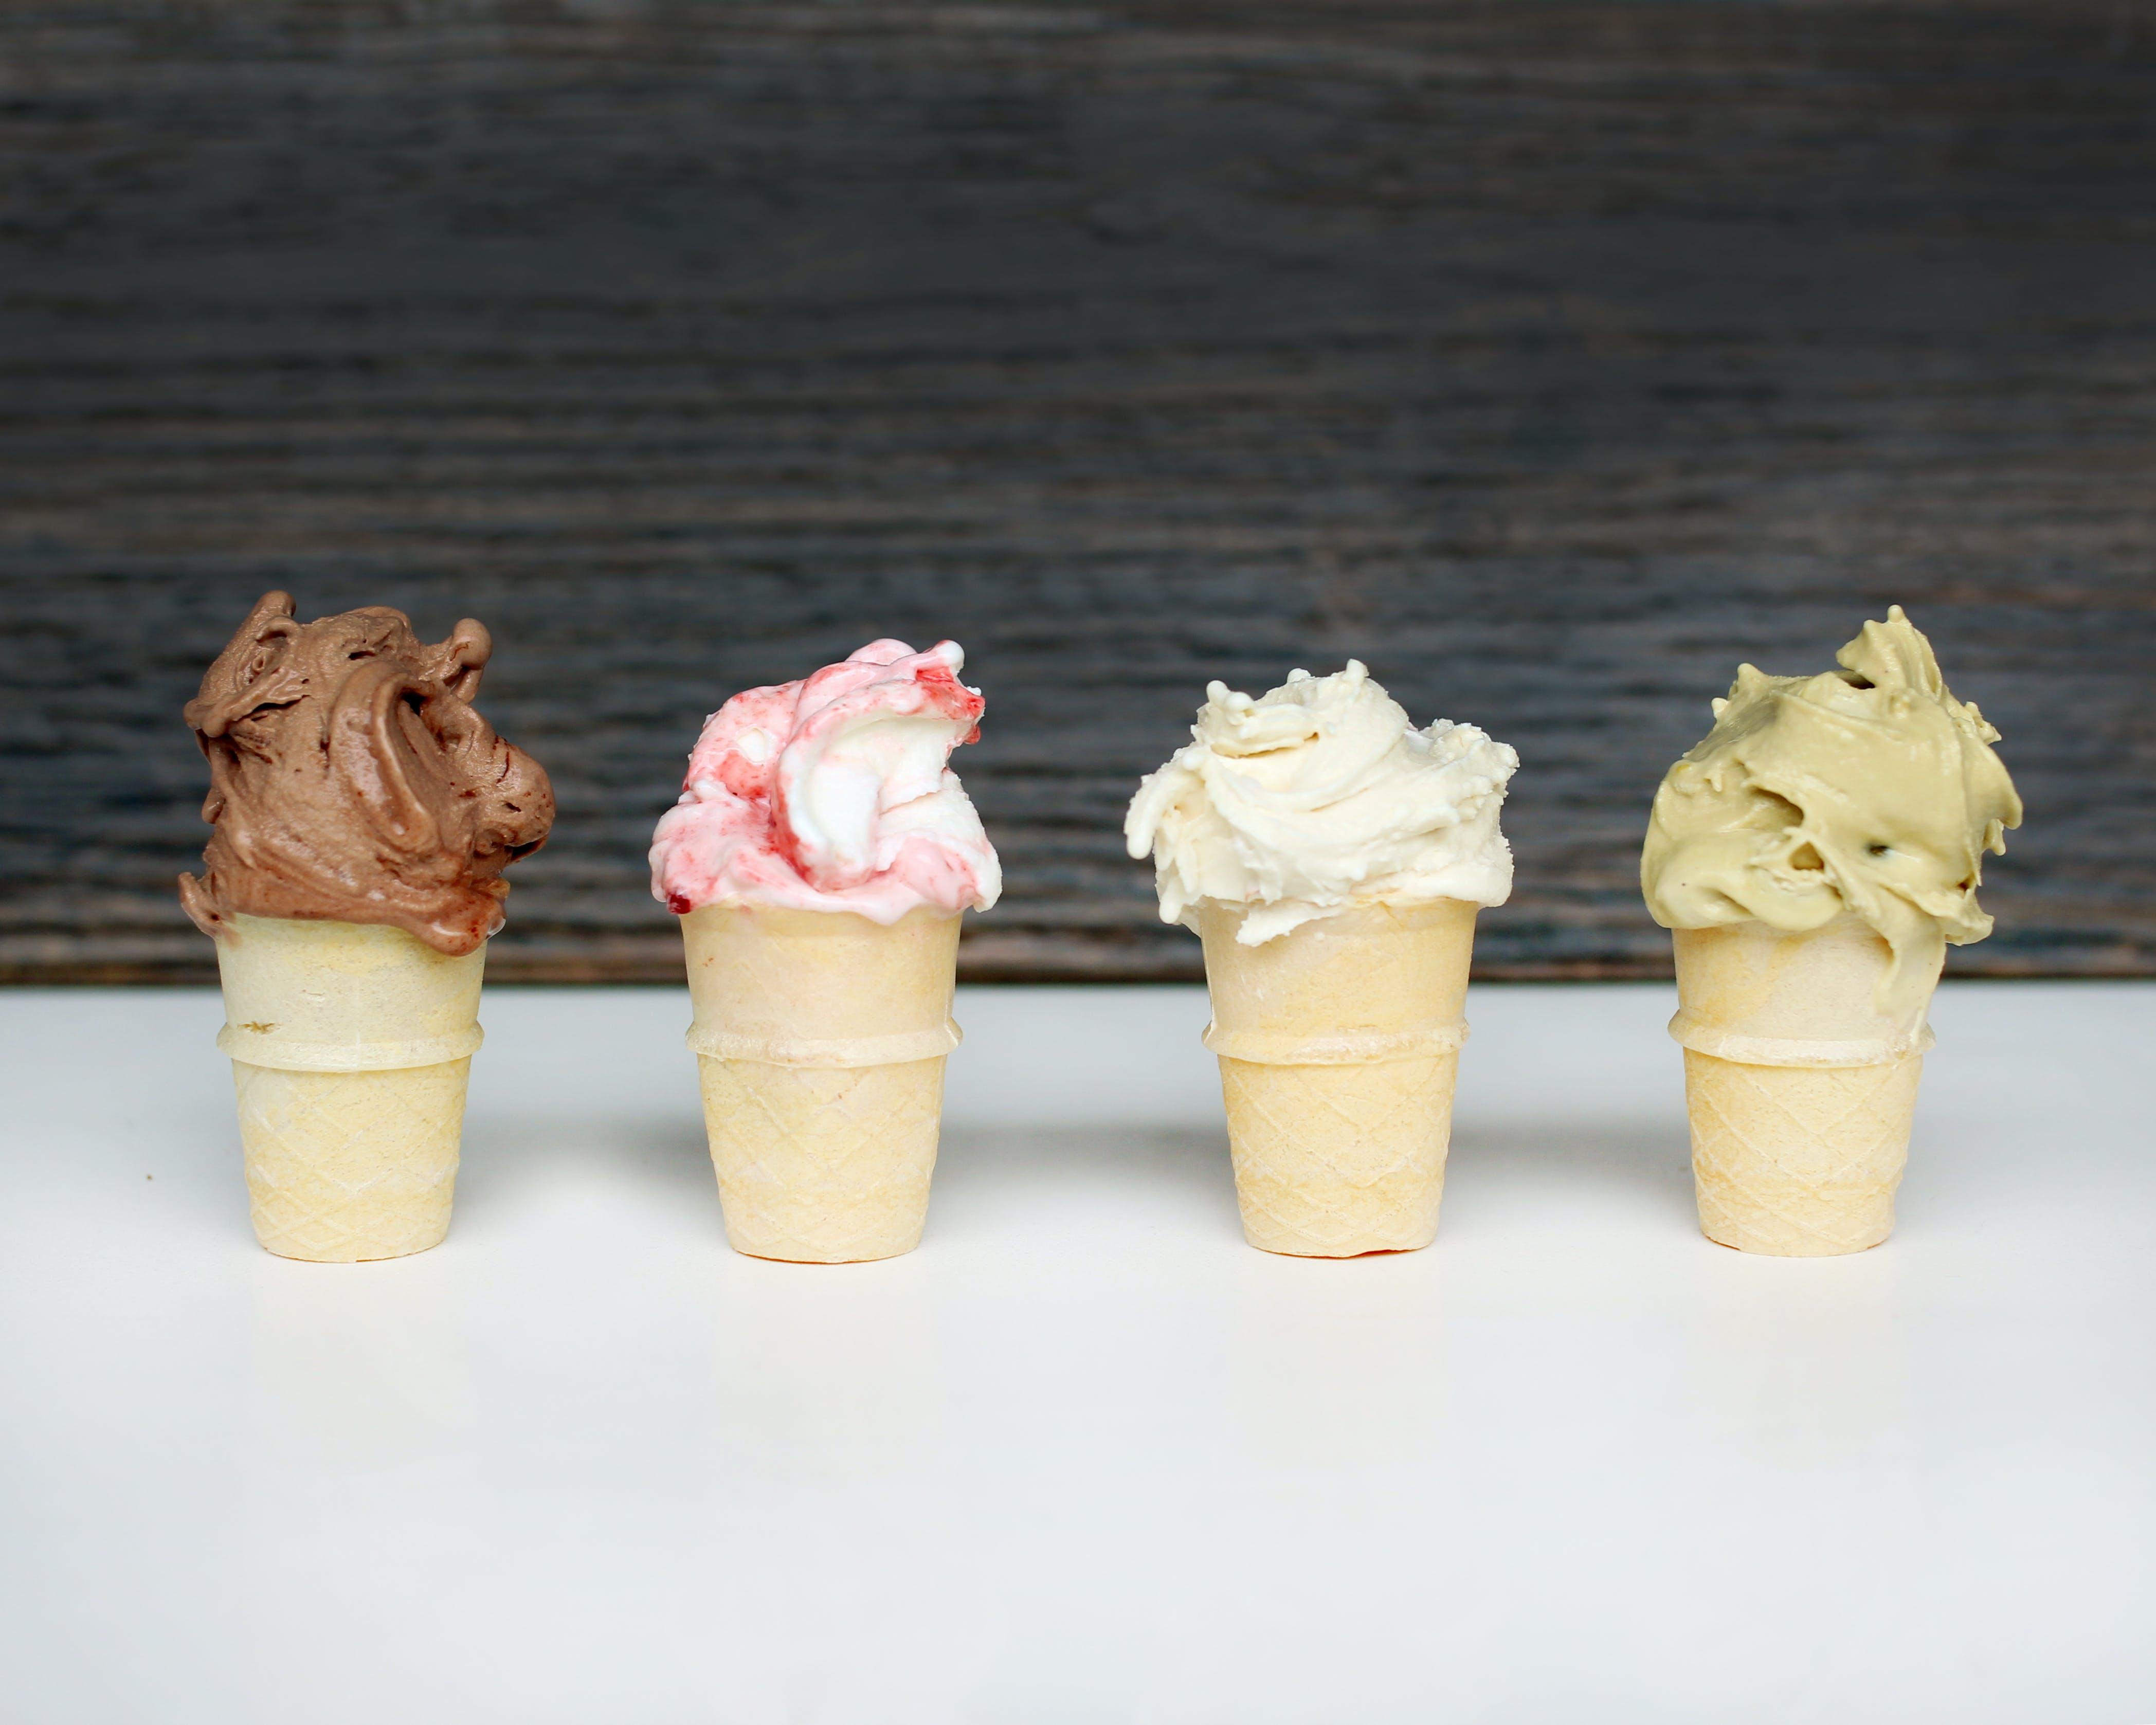 colette gelato san francisco spring activities events